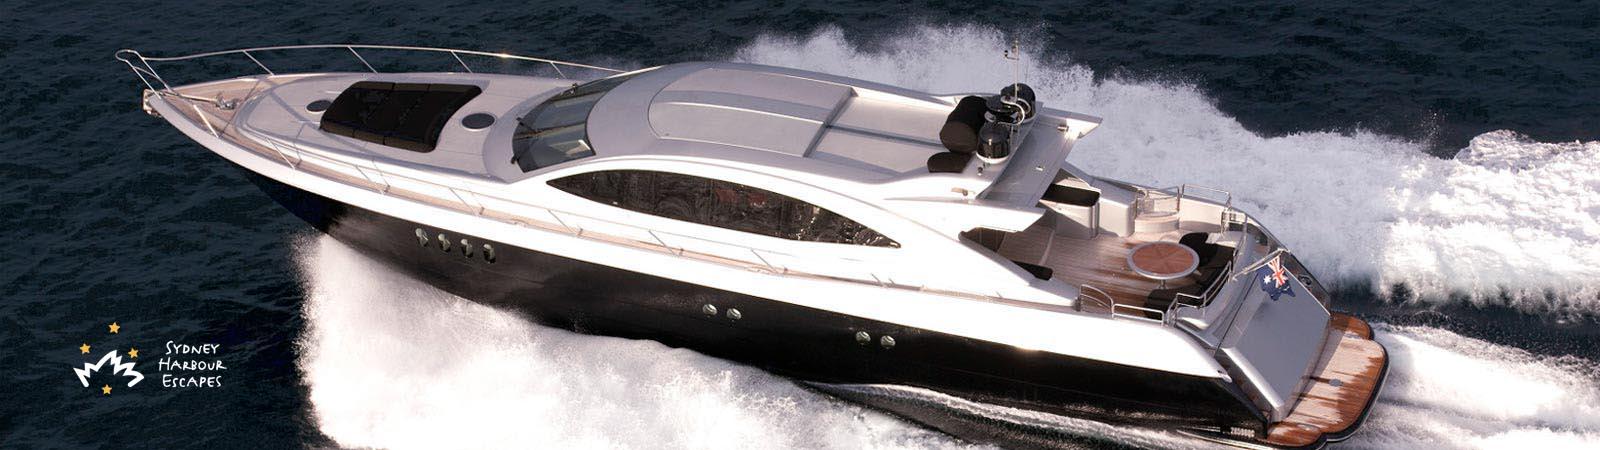 Ghost 1 Boat Exterior Cruising